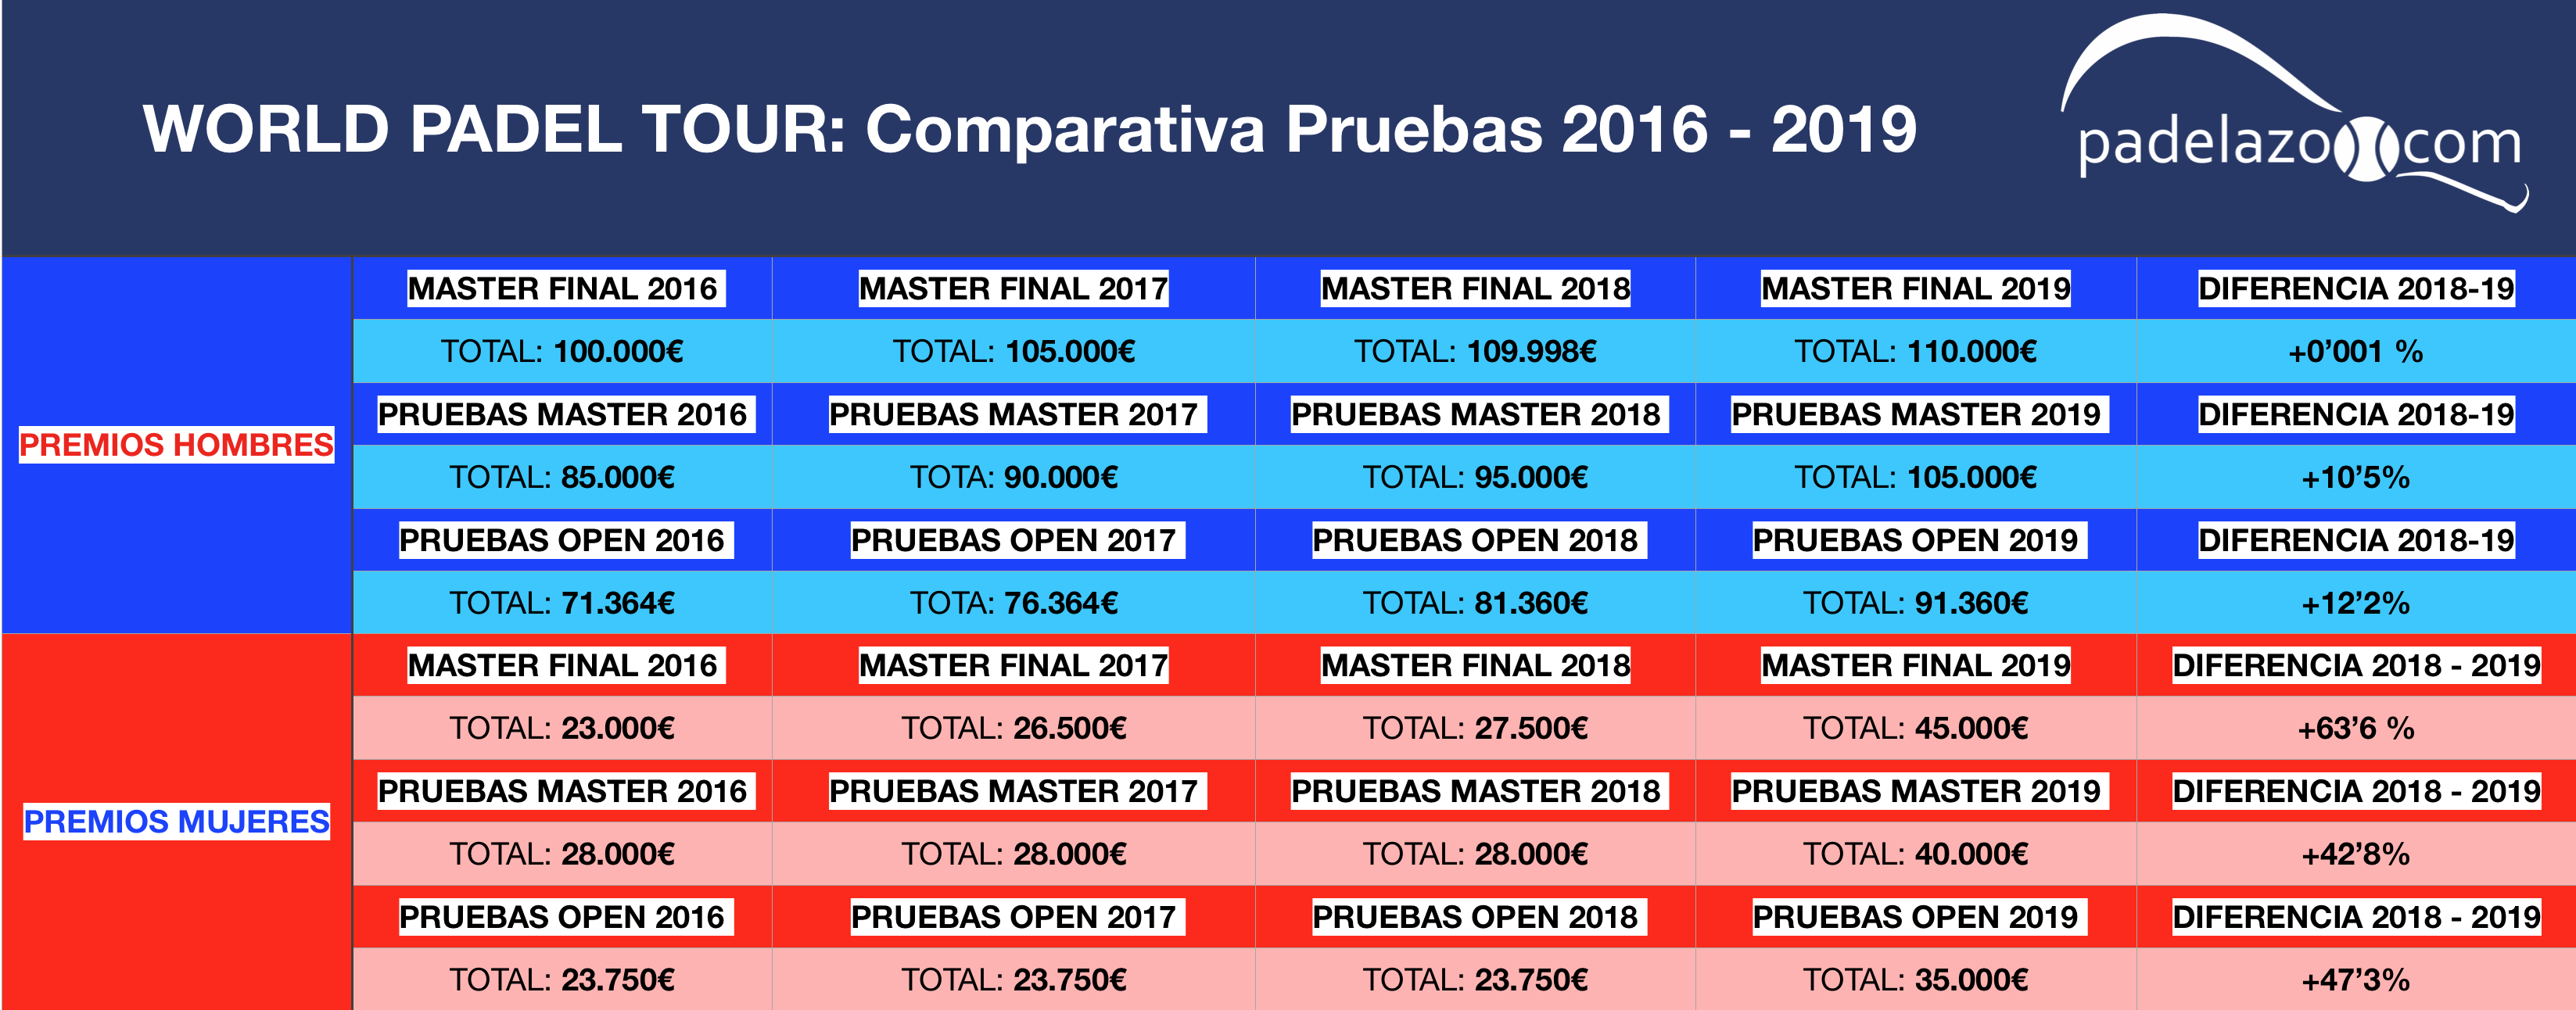 Comparativa Premios WPT masculinos femeninos 2016 - 2019